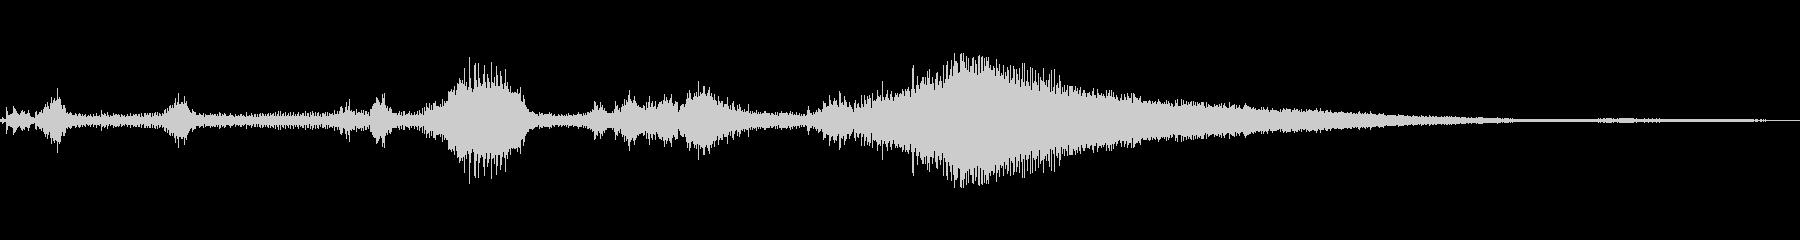 PROPANE:INT:起動、操作...の未再生の波形